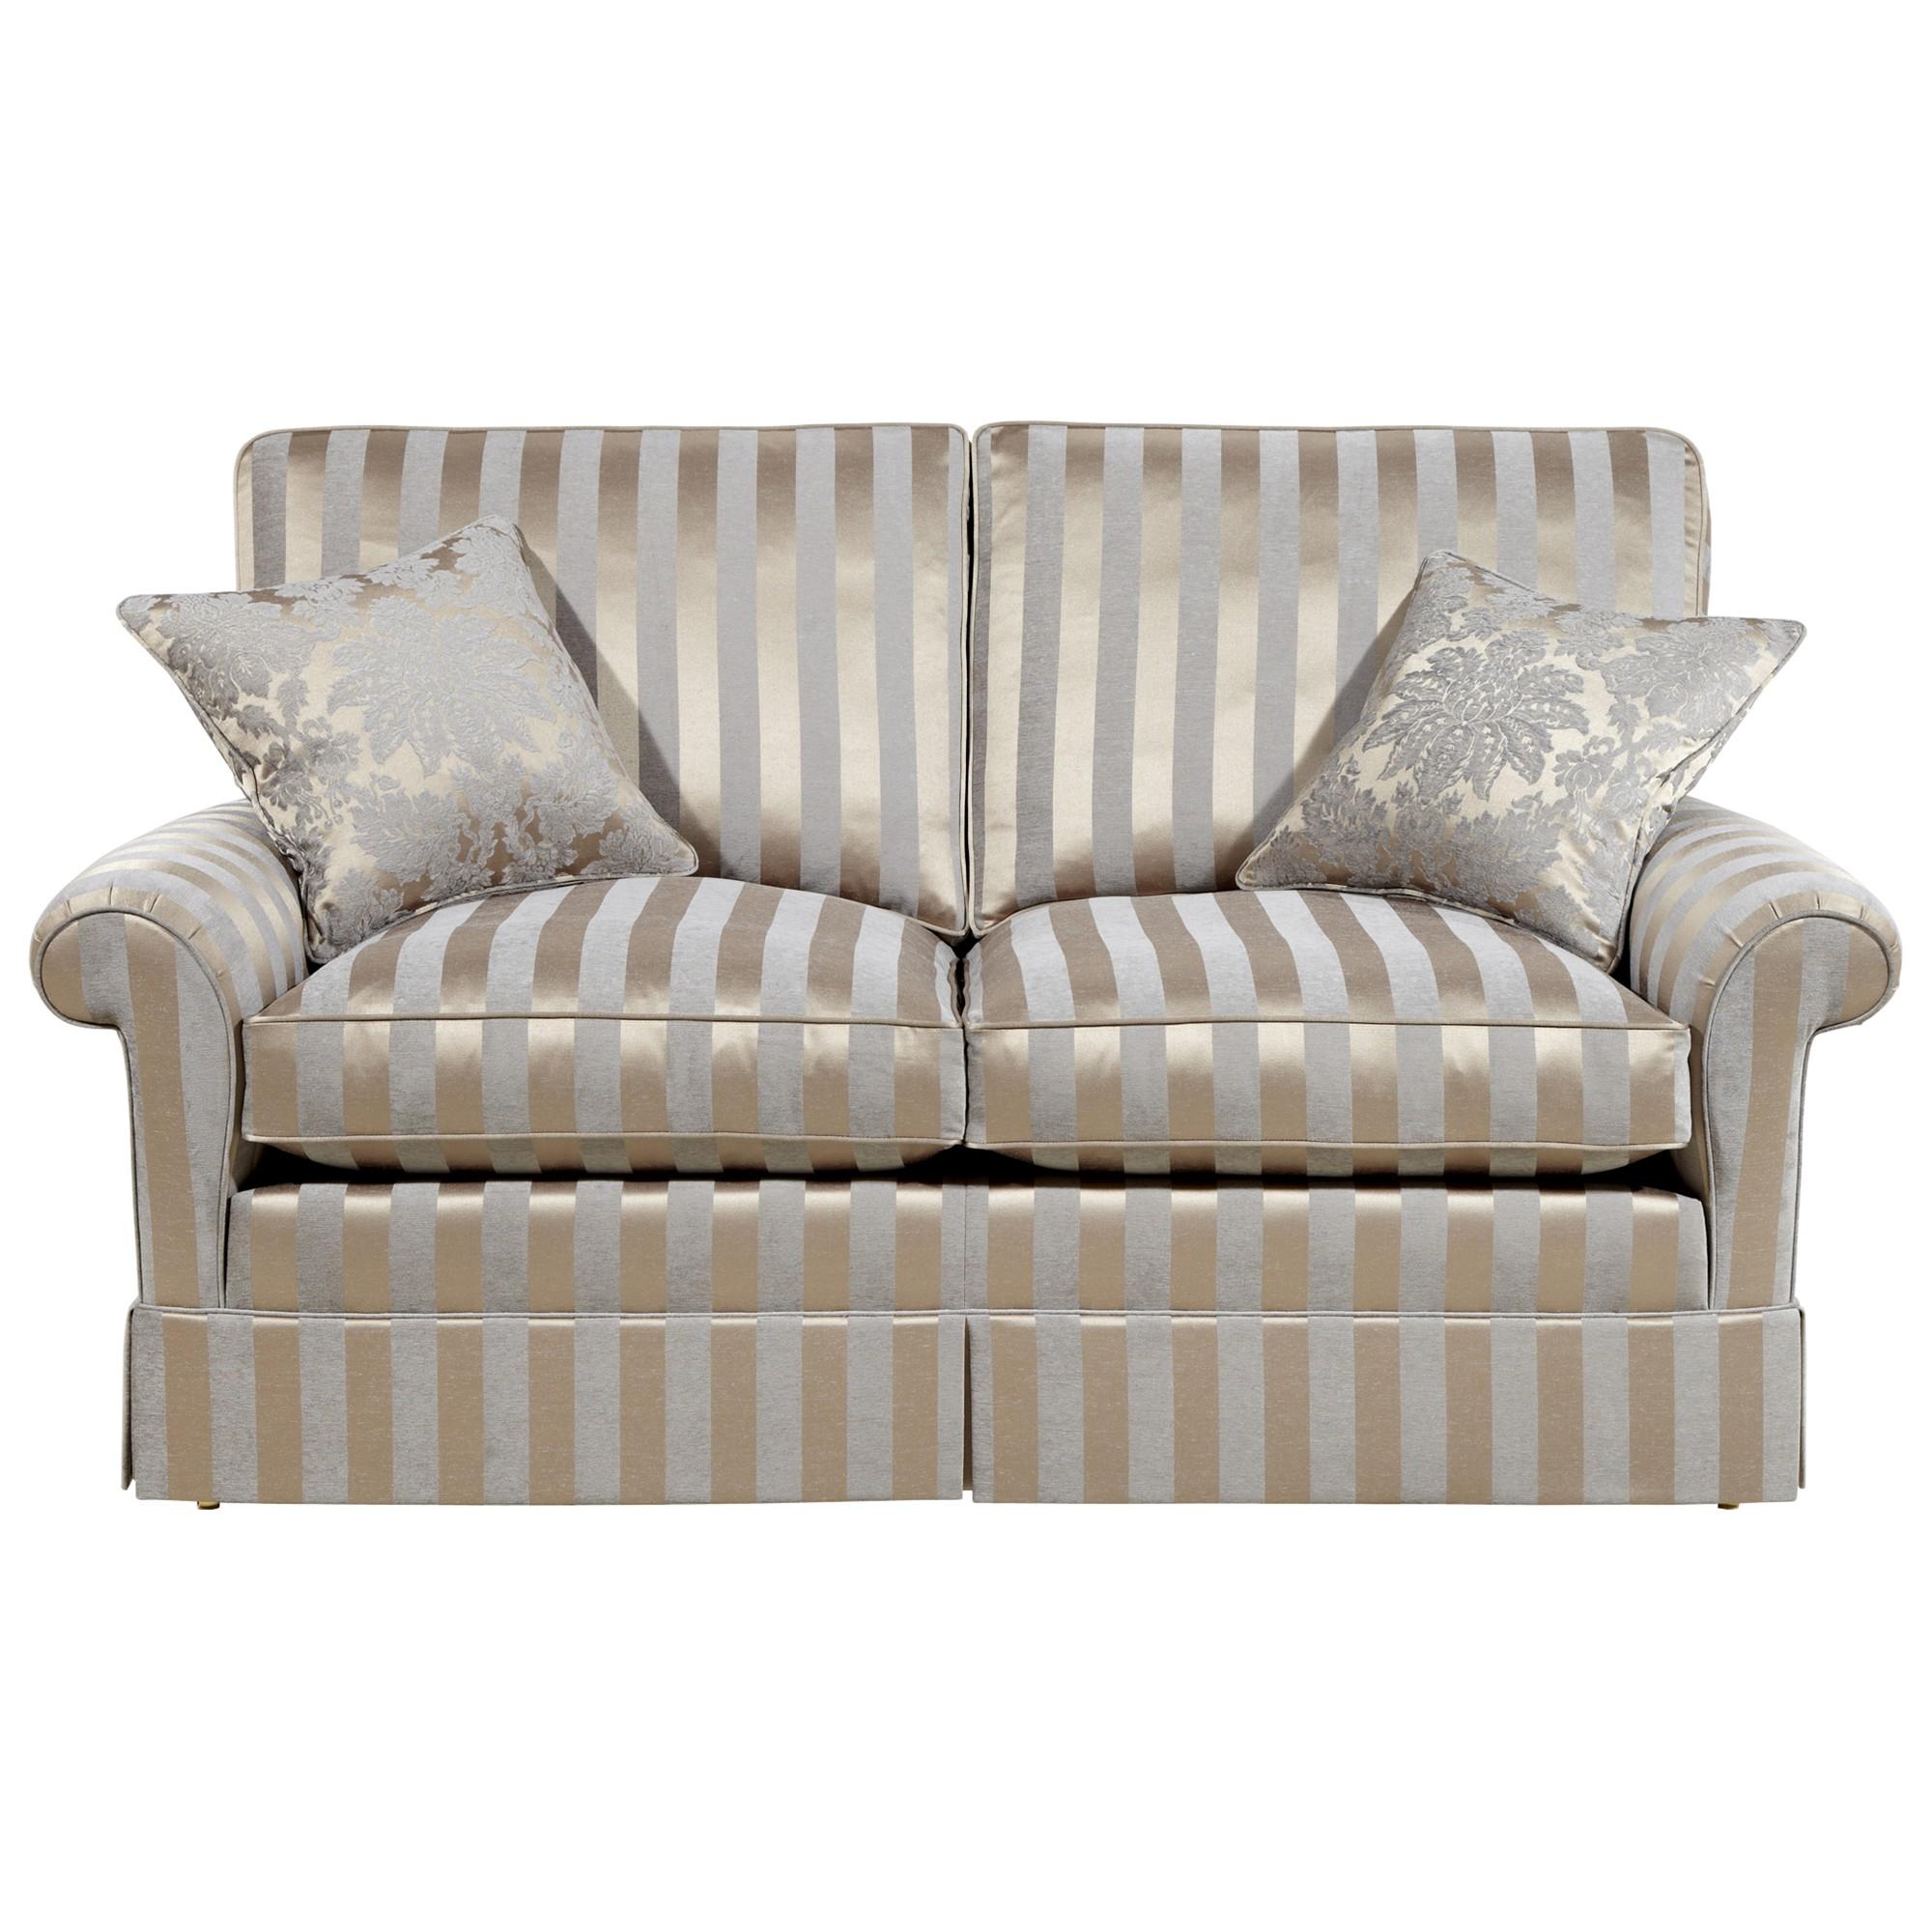 Duresta Woburn Large Sofa Oscar Silver Stripe Review